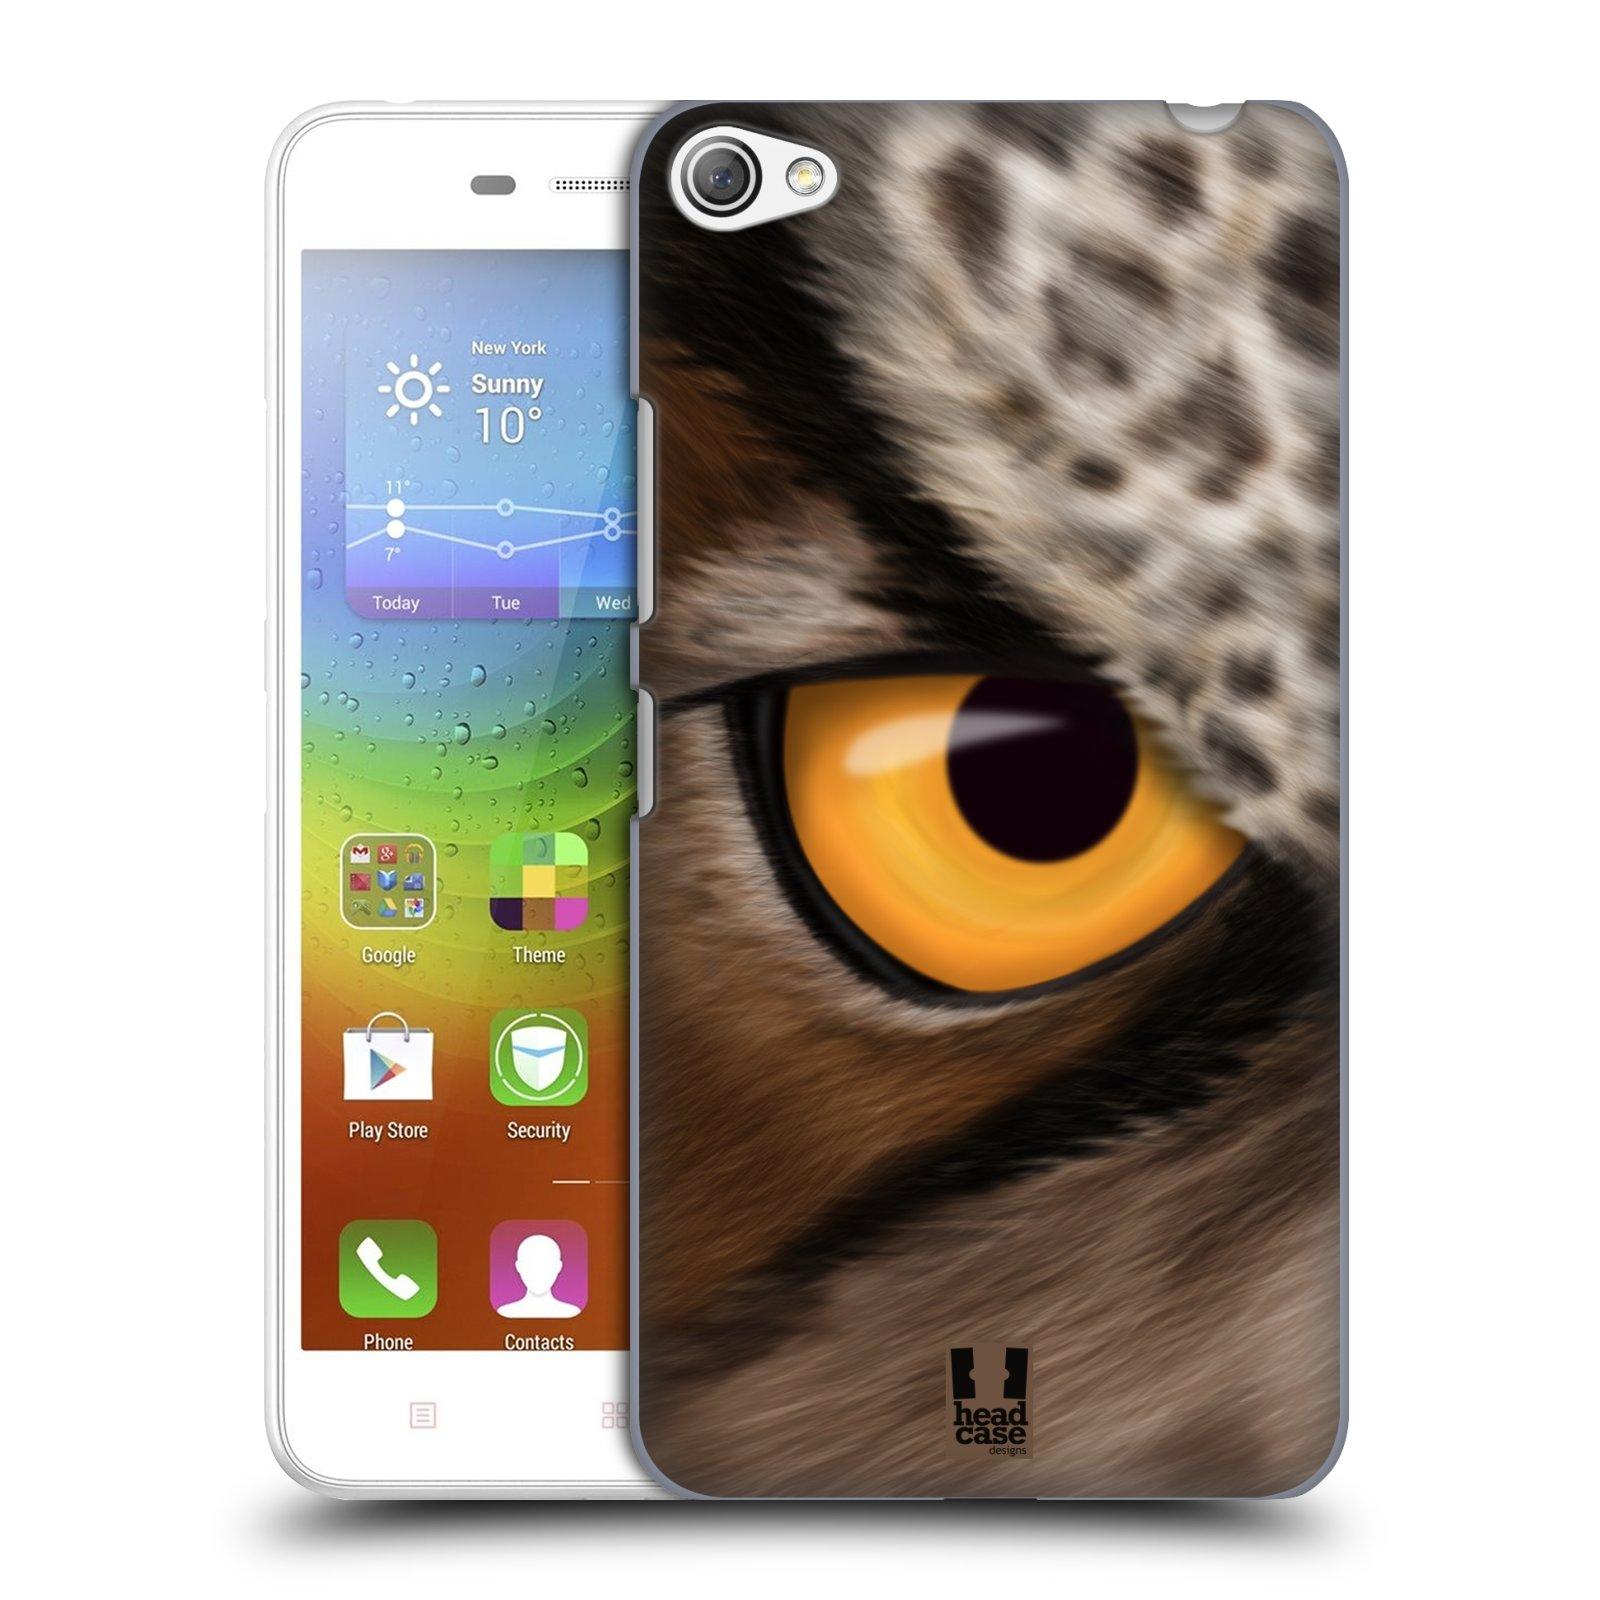 HEAD CASE pevný plastový obal na mobil LENOVO S60 / LENOVO S60 DUAL SIM vzor pohled zvířete oko sova